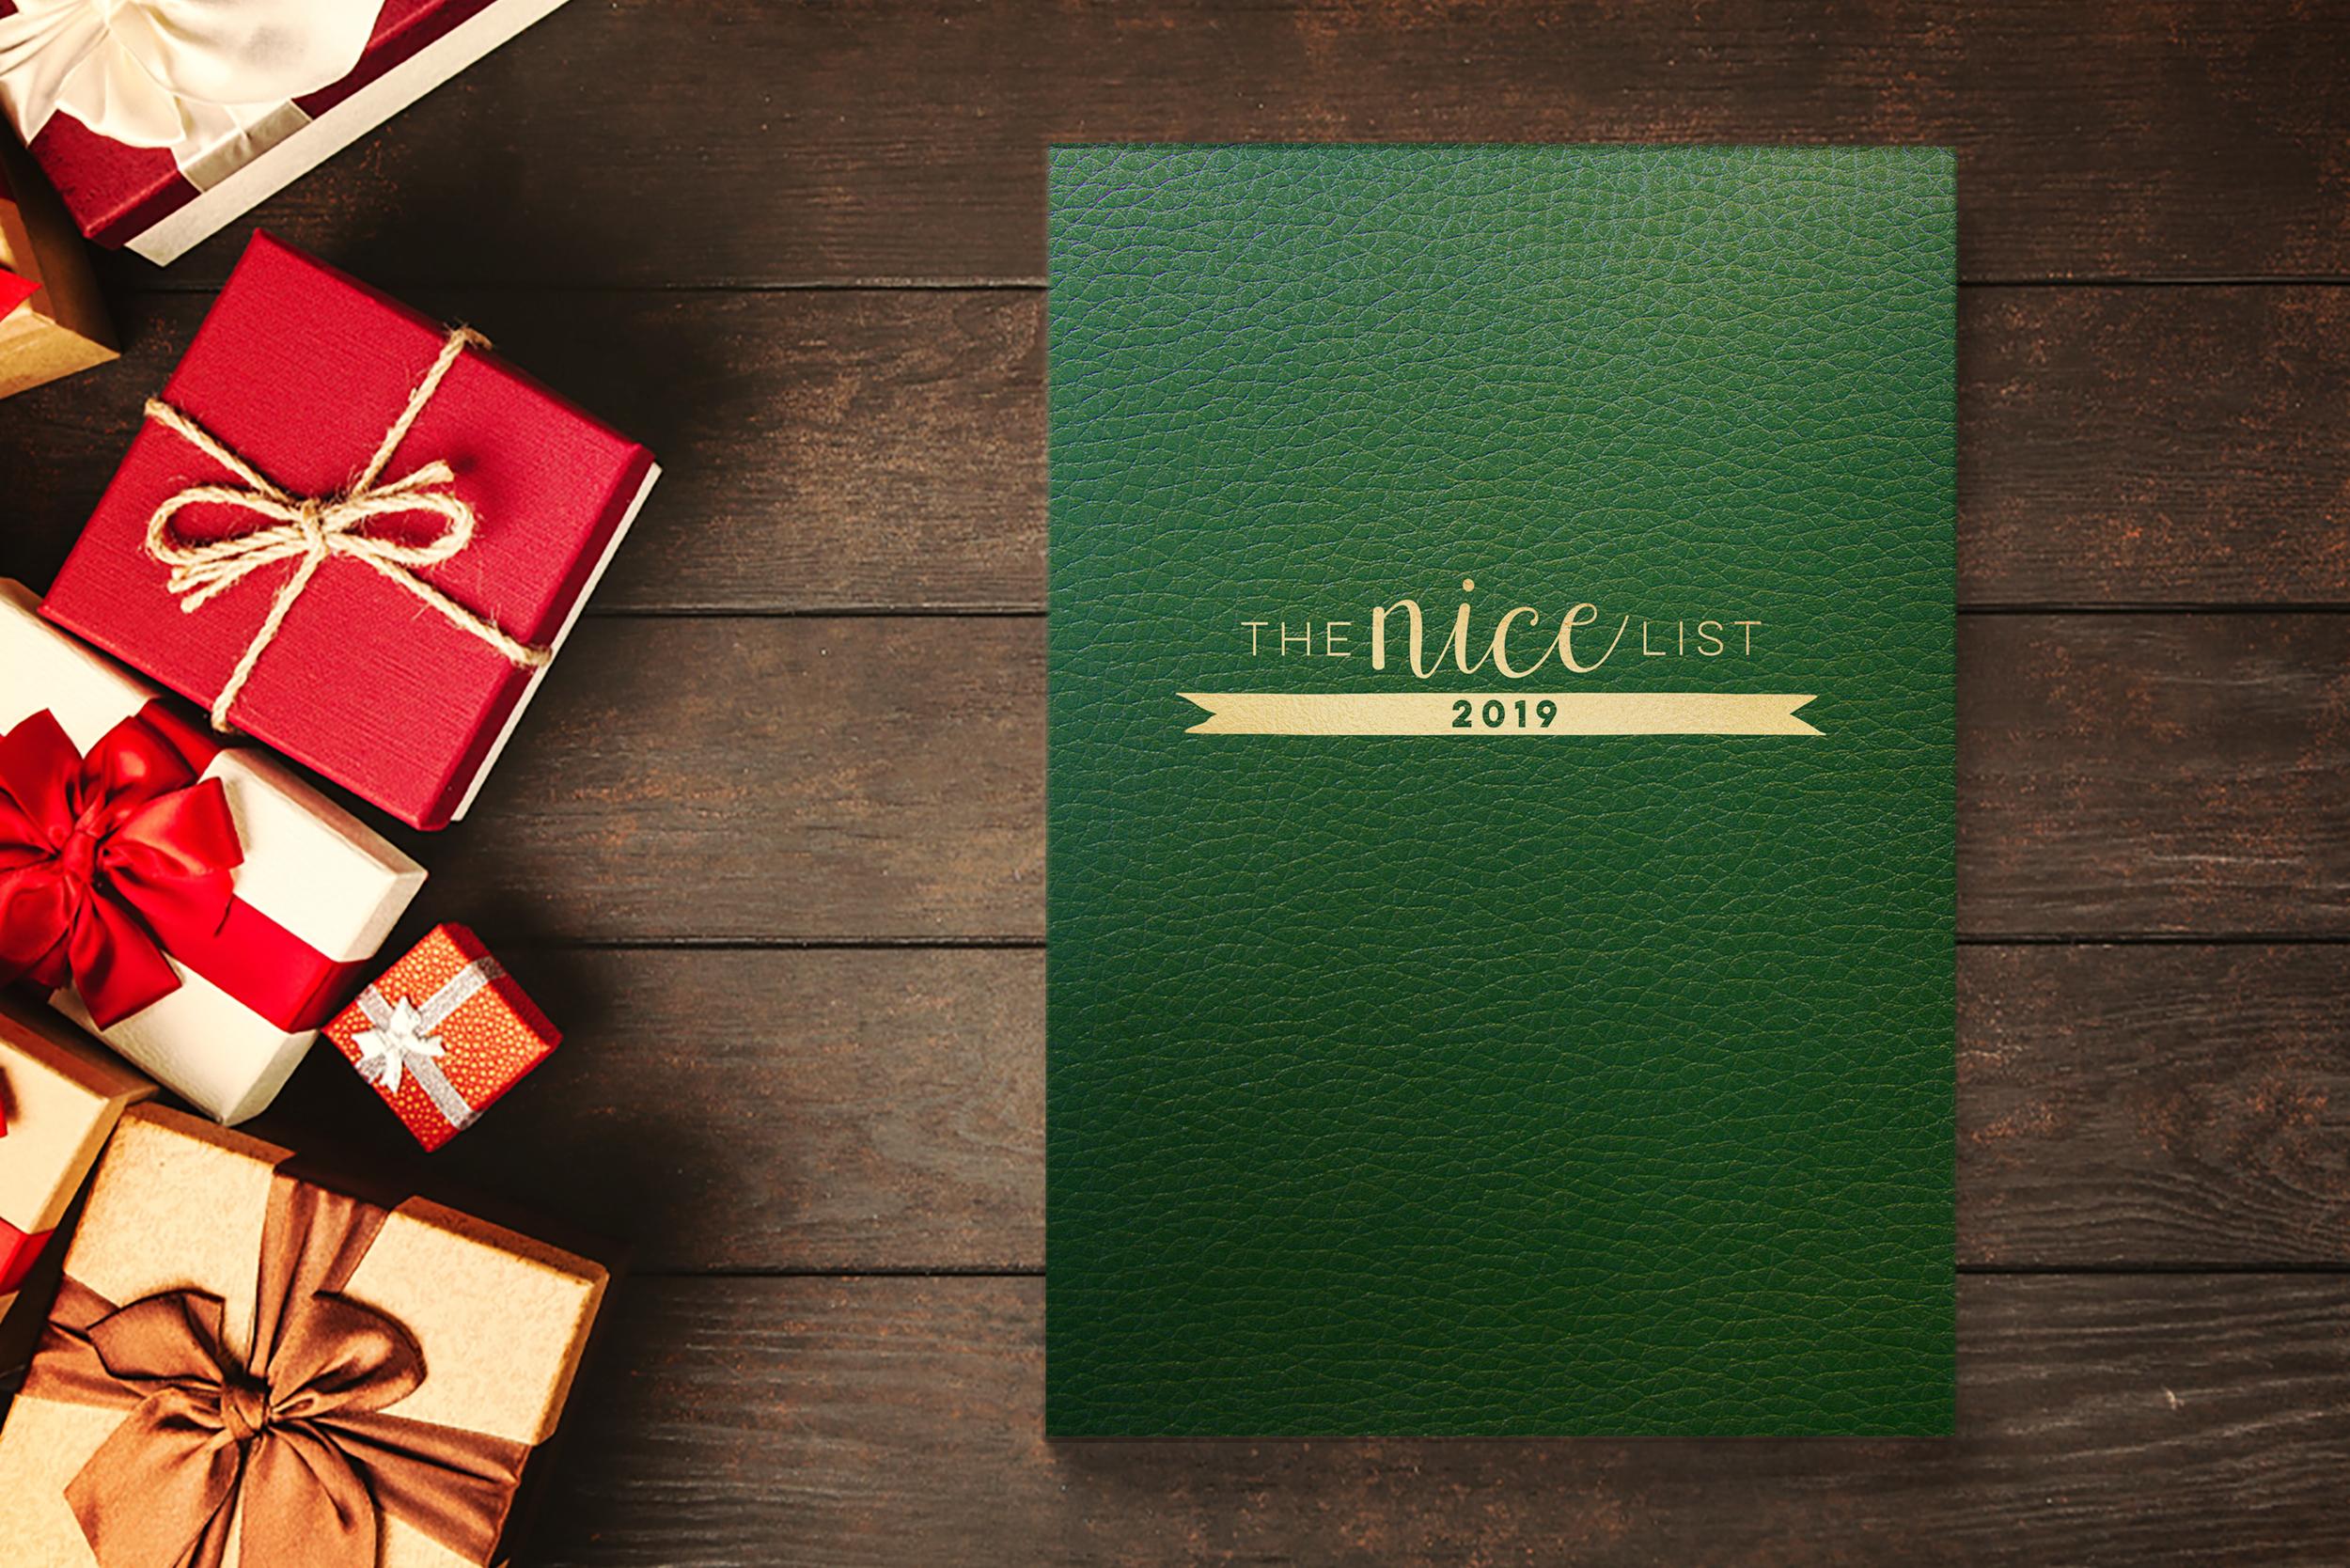 Nice List Book Mockup 2019_BIG_cover green.png